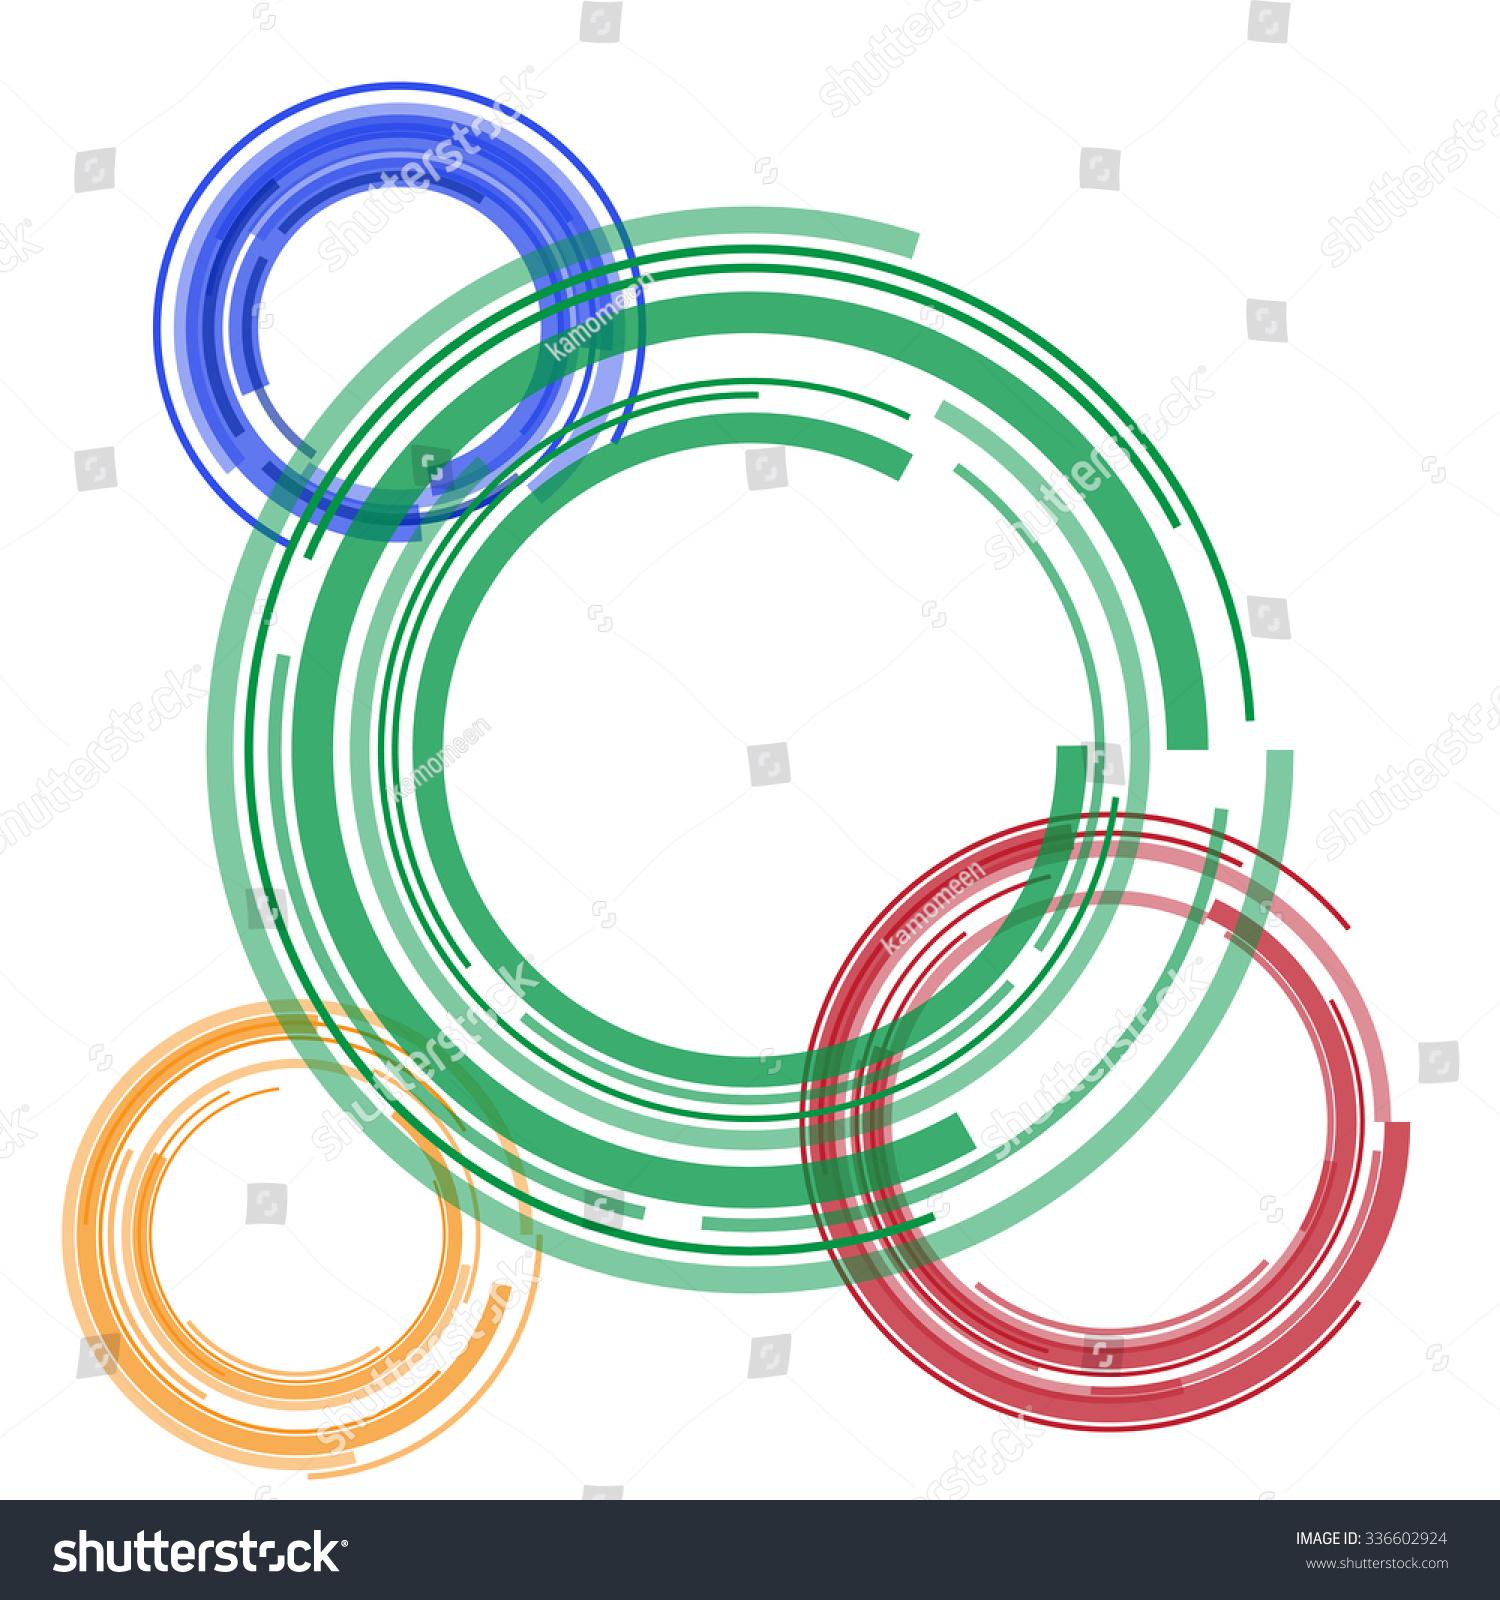 Circle Graphics Art Stock Vector 336602924 - Shutterstock